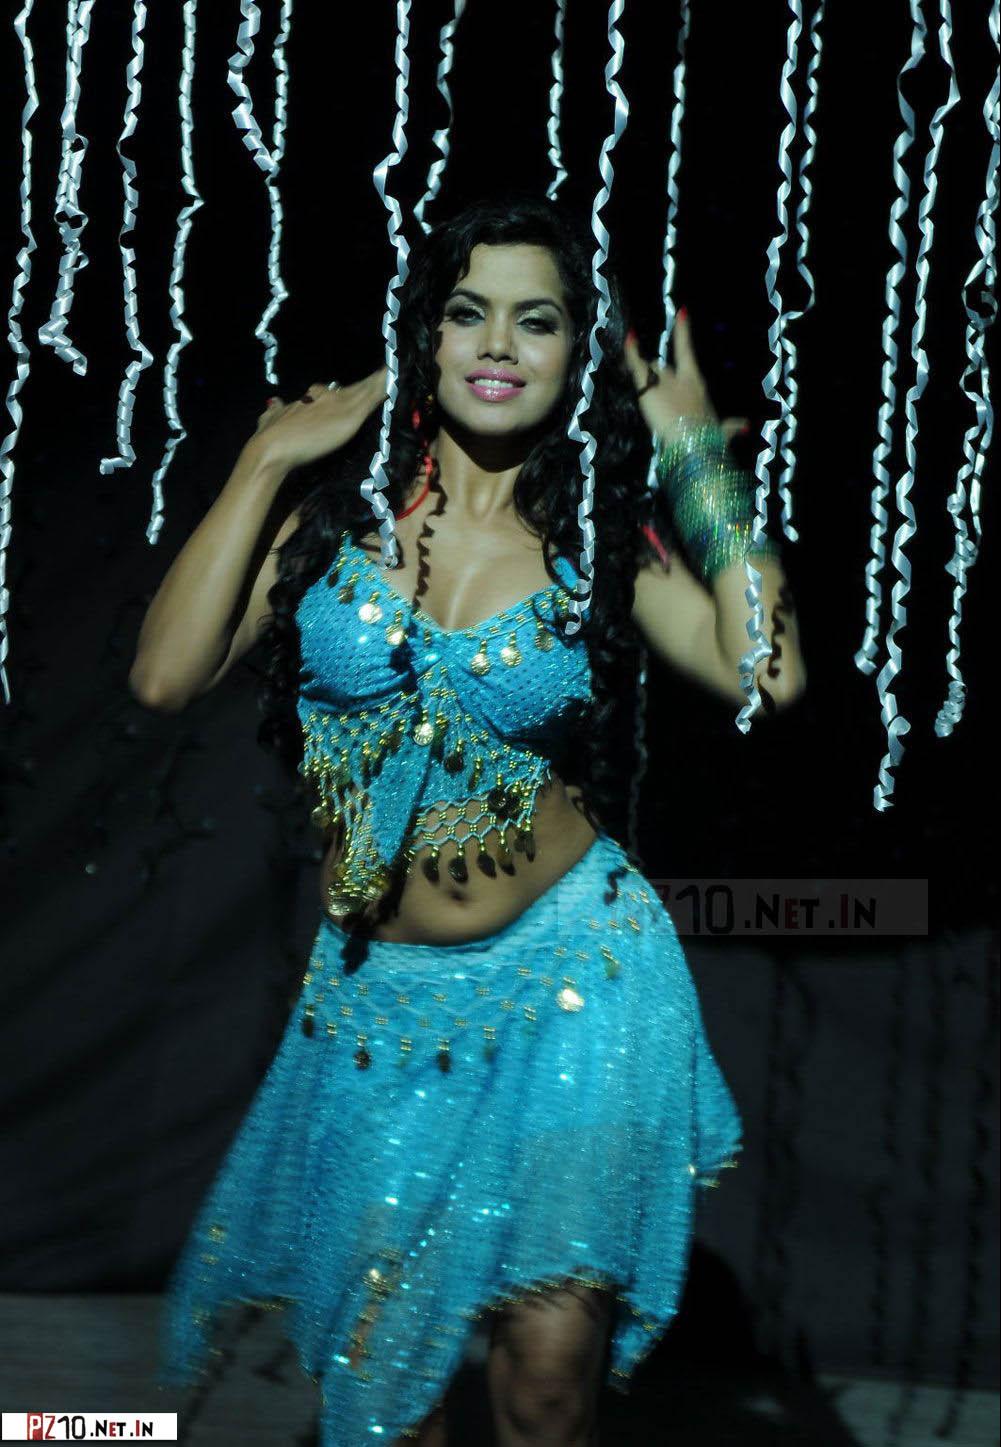 South Indian Item Girl Vasool Raja Photoshoot Nov 2012 -1872